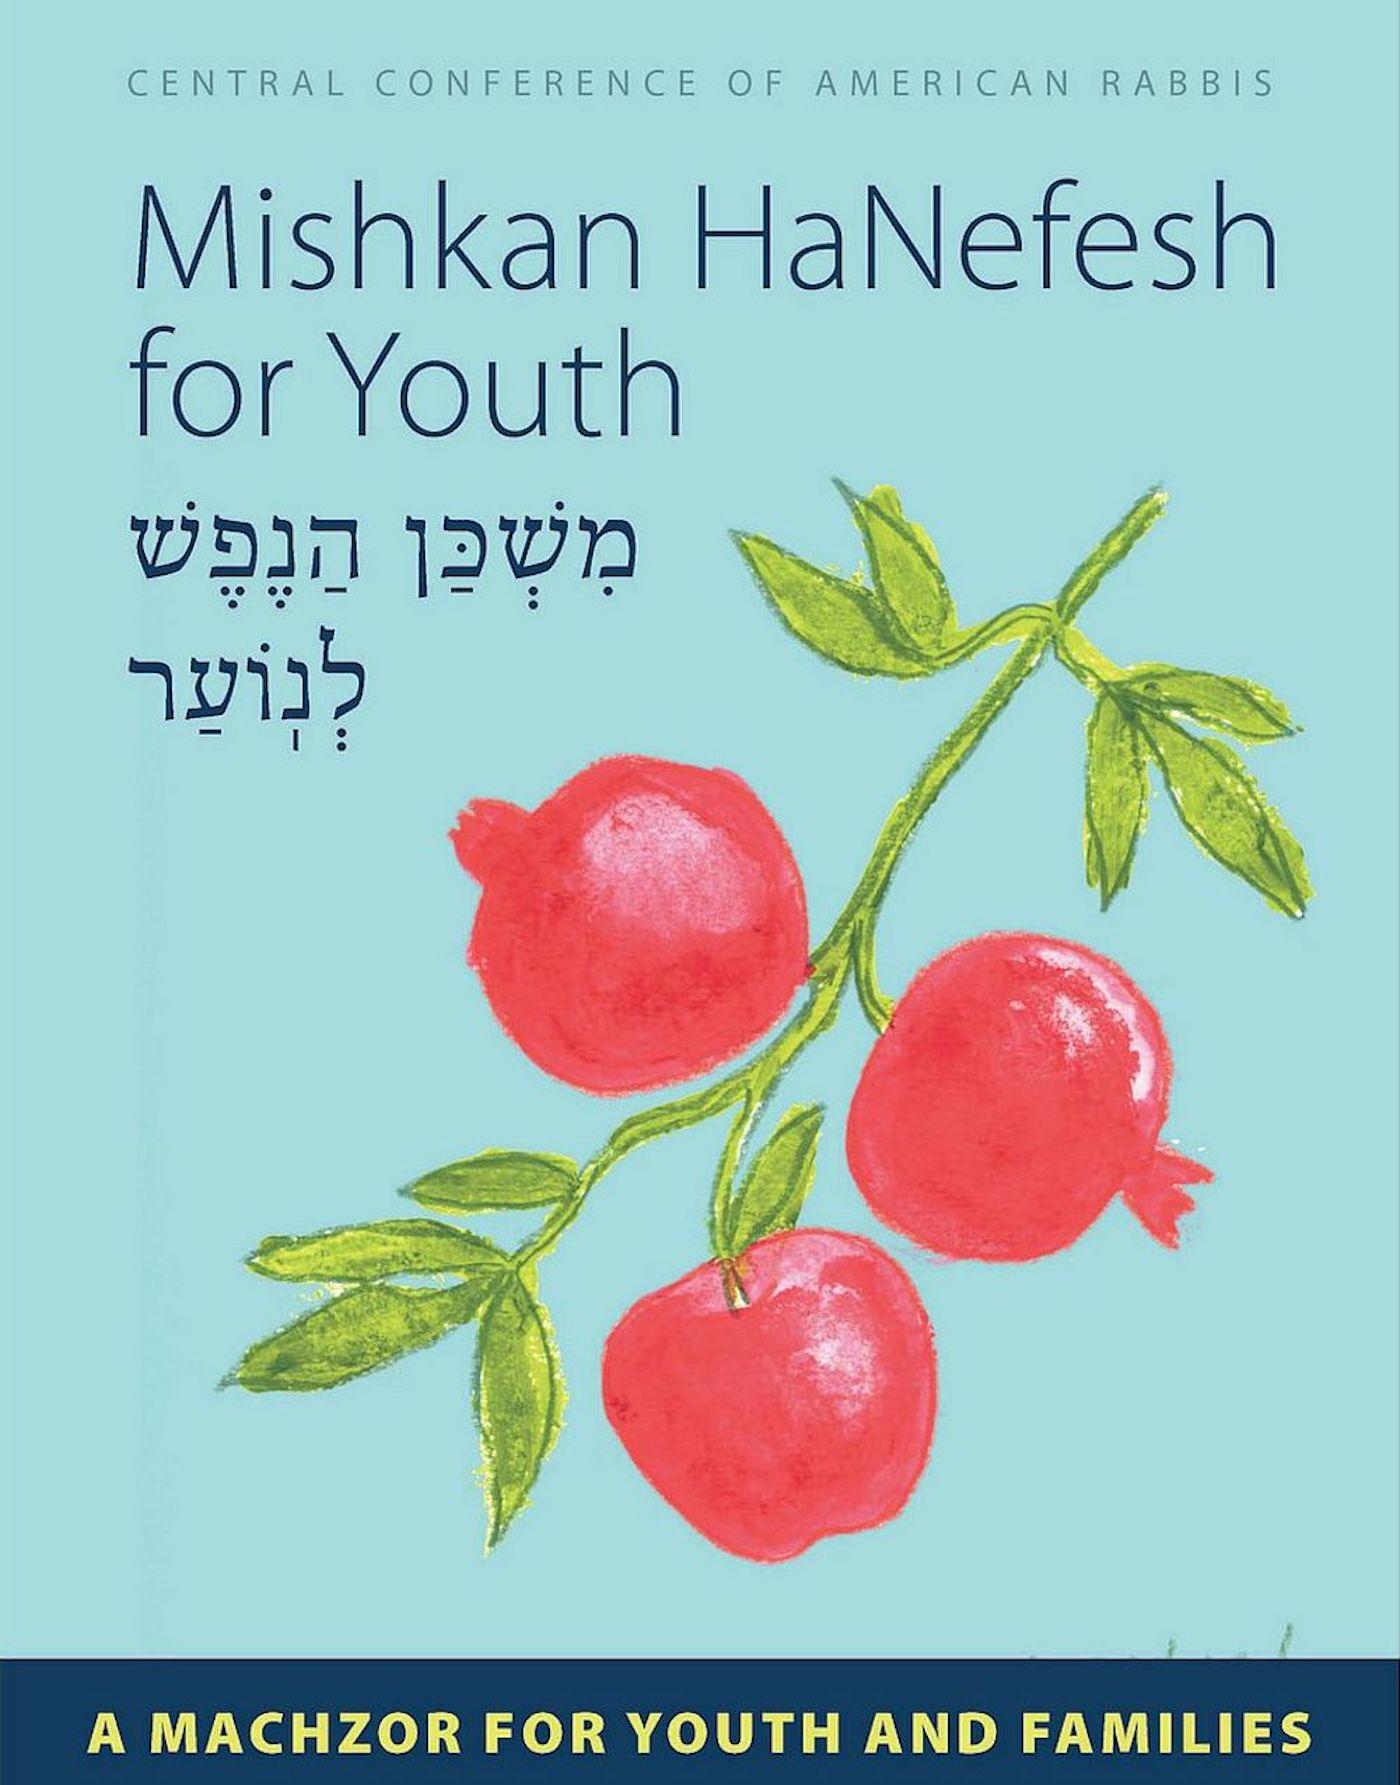 Mishkan HaNefesh for Youth